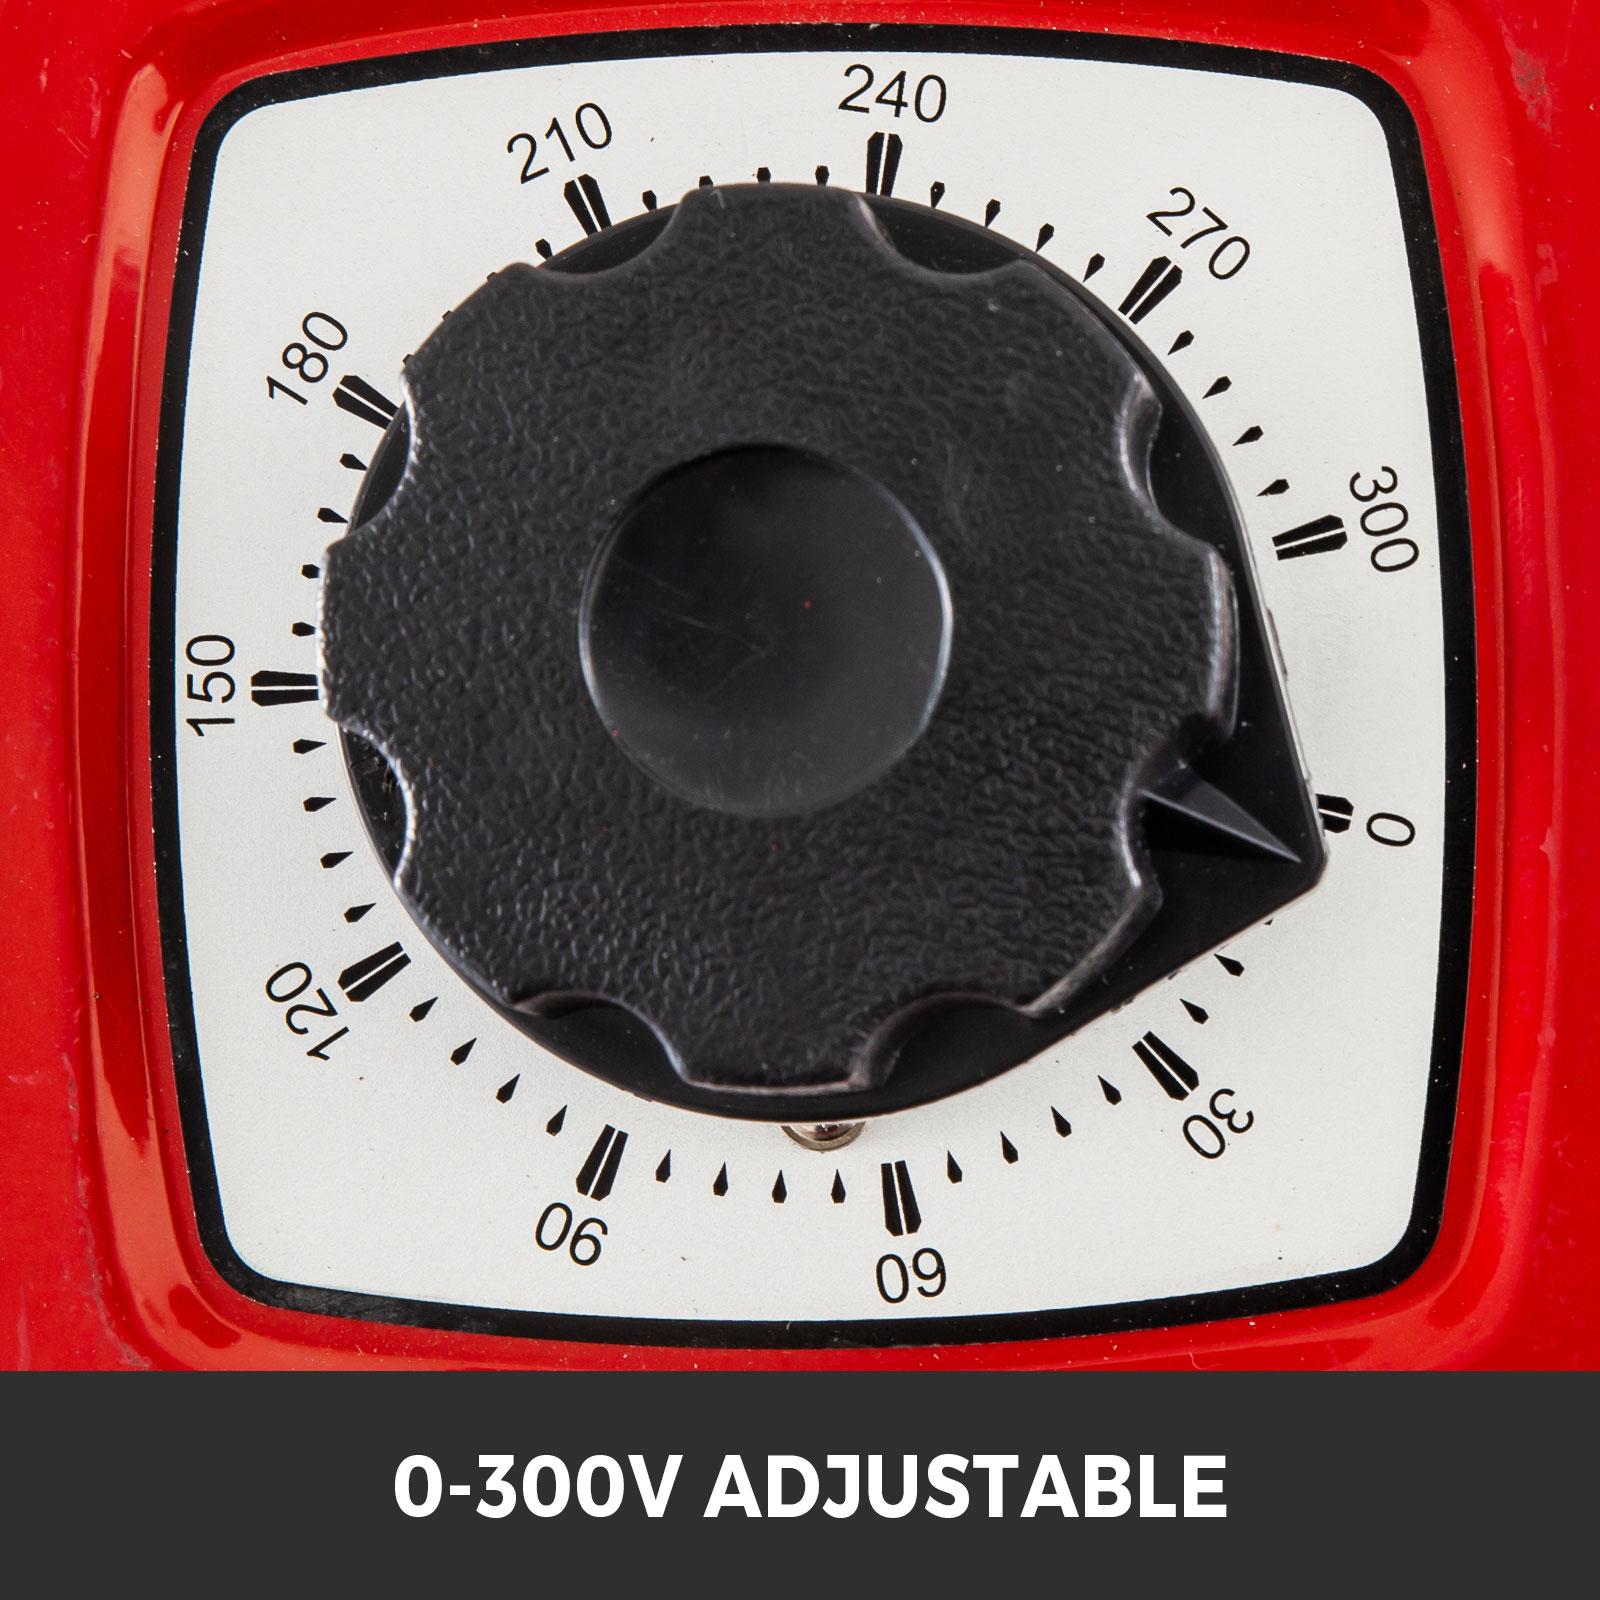 Auto-Variac-Variable-Transformer-0-5-1-2-3KVA-Regulator-pure-copper-coil-220V thumbnail 15